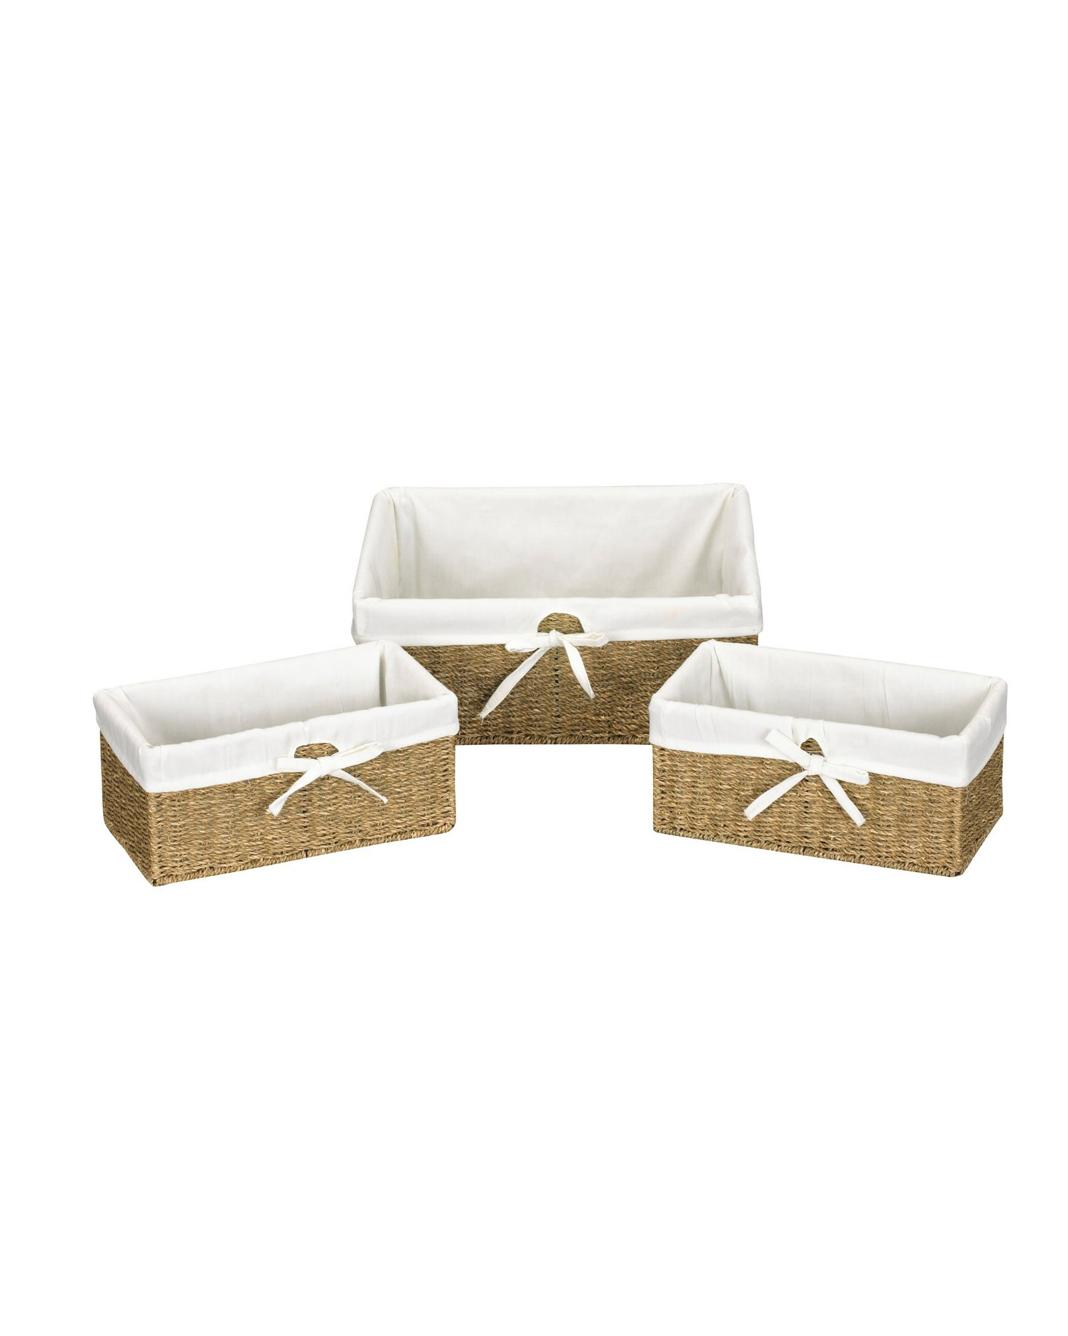 blueprint-team-cleaning-registry-household-essentials-three-woven-seagrass-storage-utility-baskets-1015.jpg